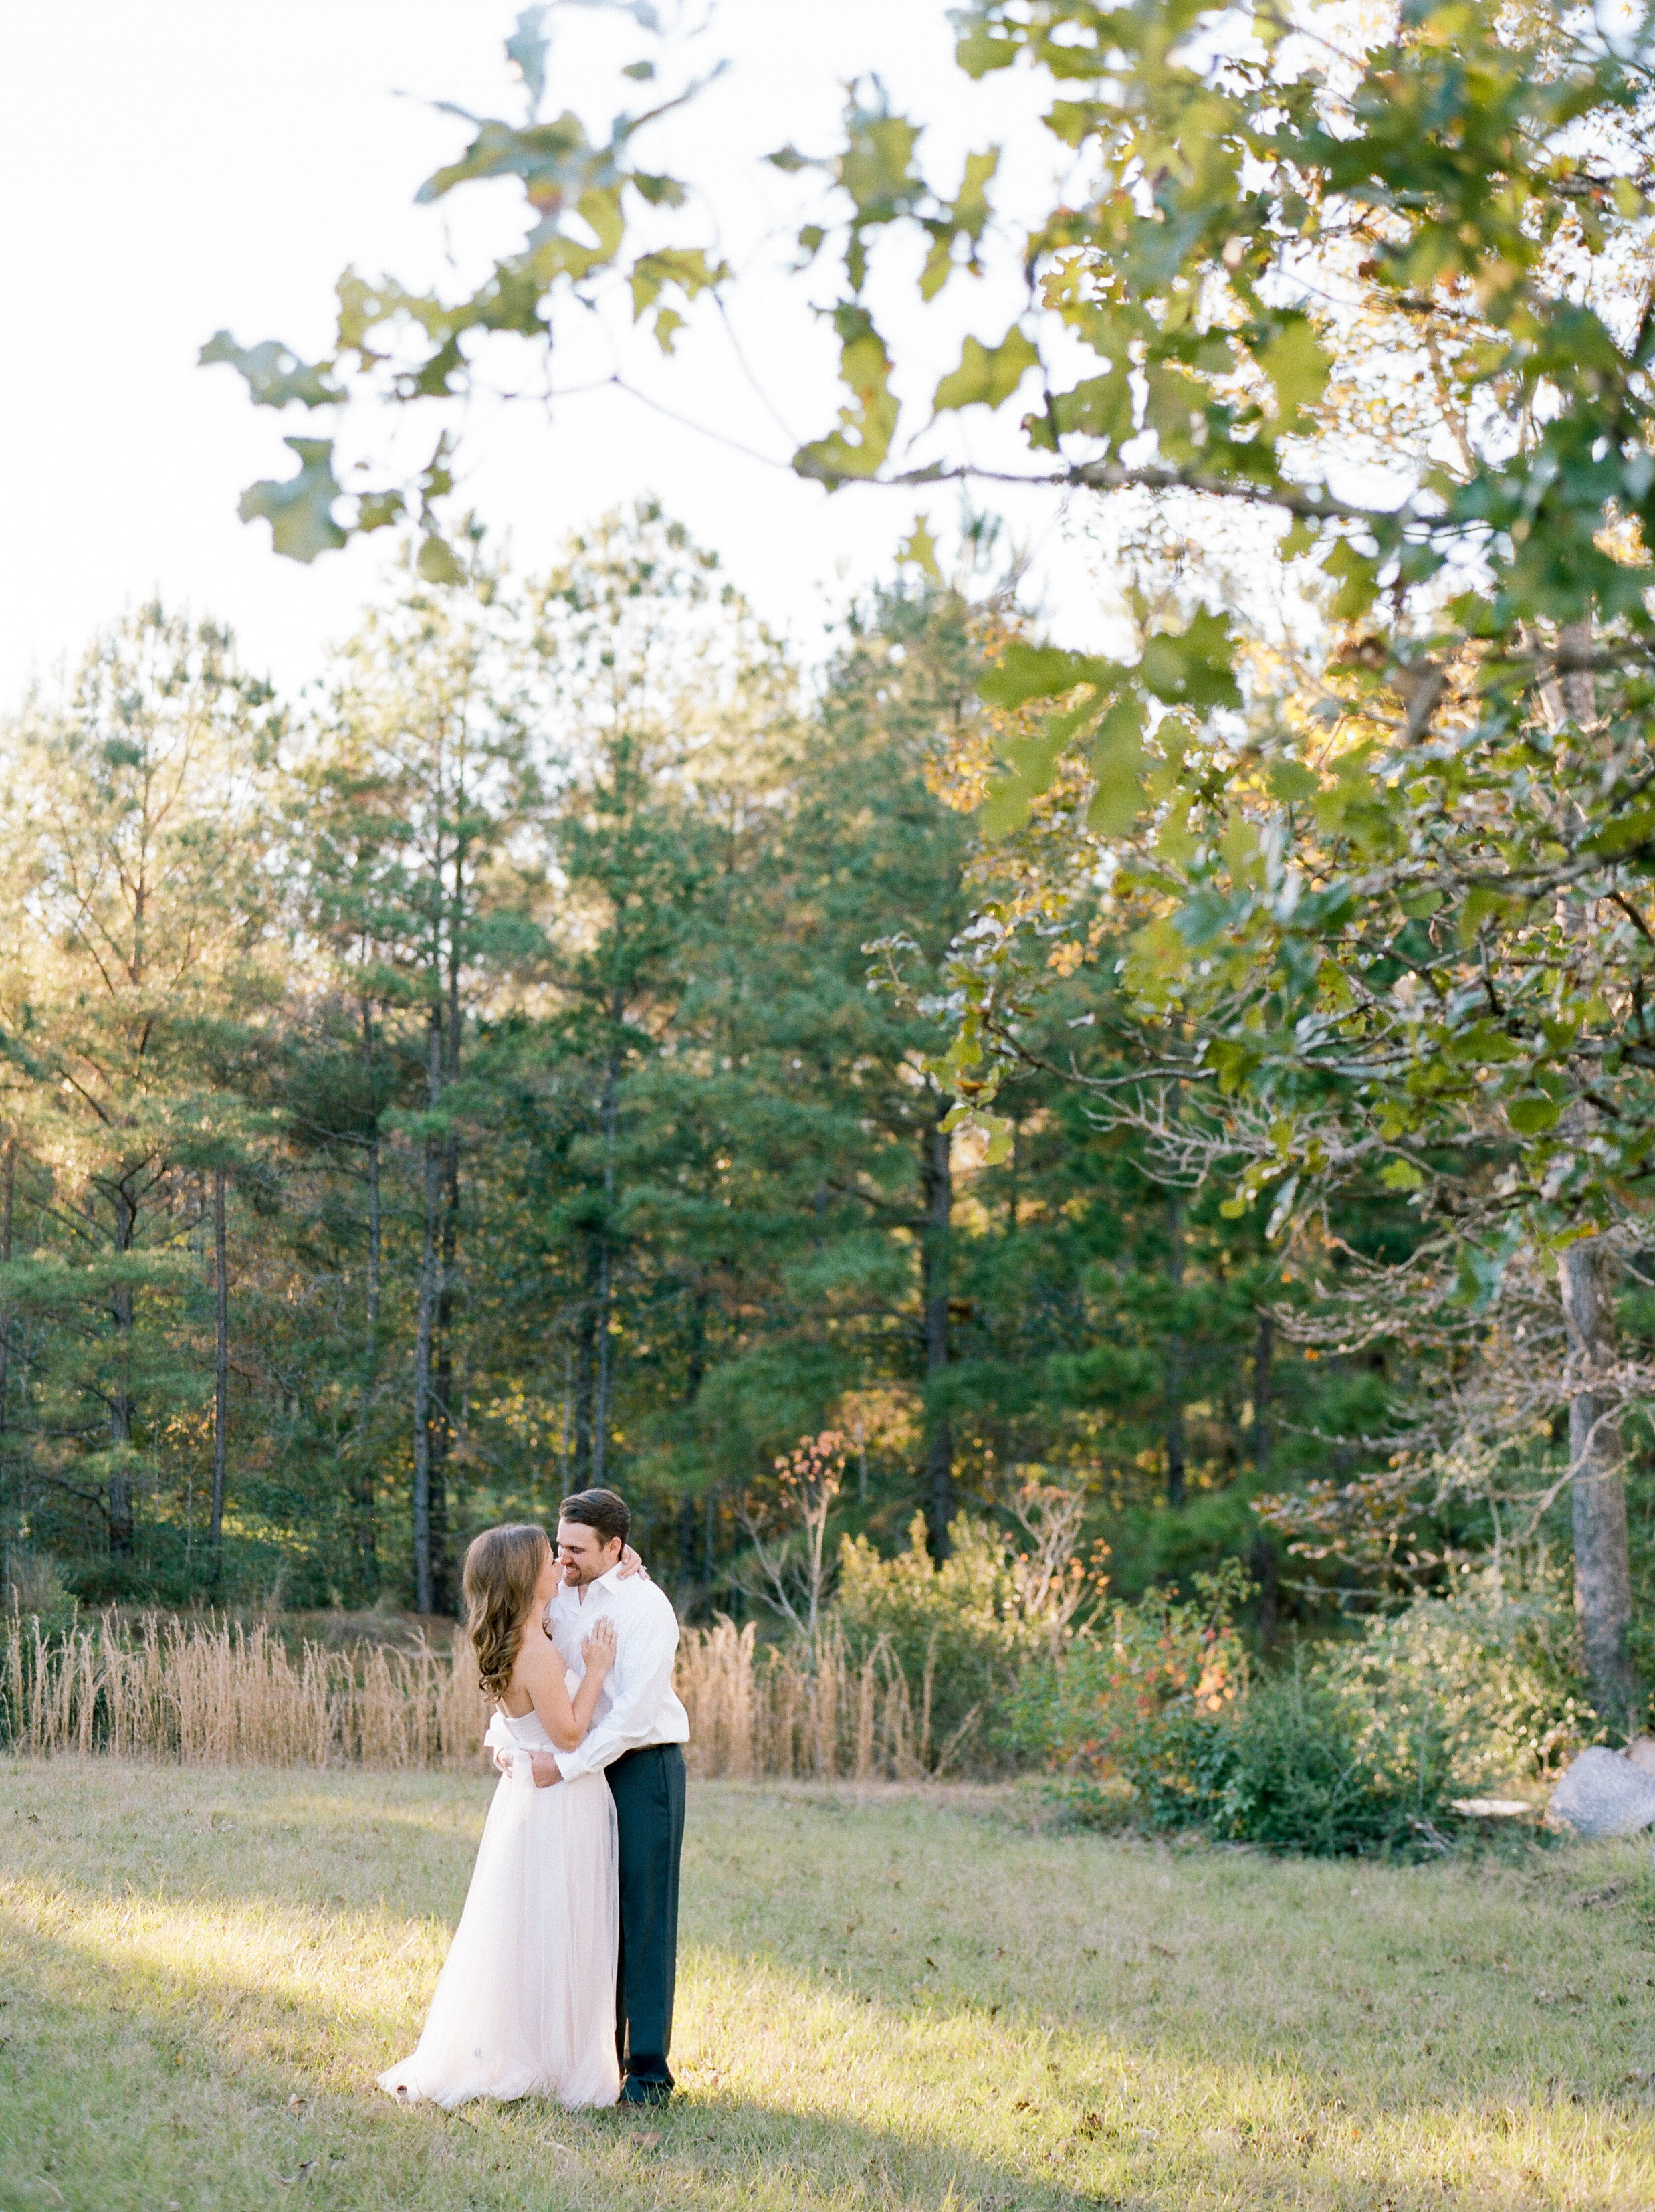 dana-fernandez-photography-houston-wedding-photographer-portraits-engagements-anniversary-session-film-photographer-austin-wedding-photographer-5.jpg